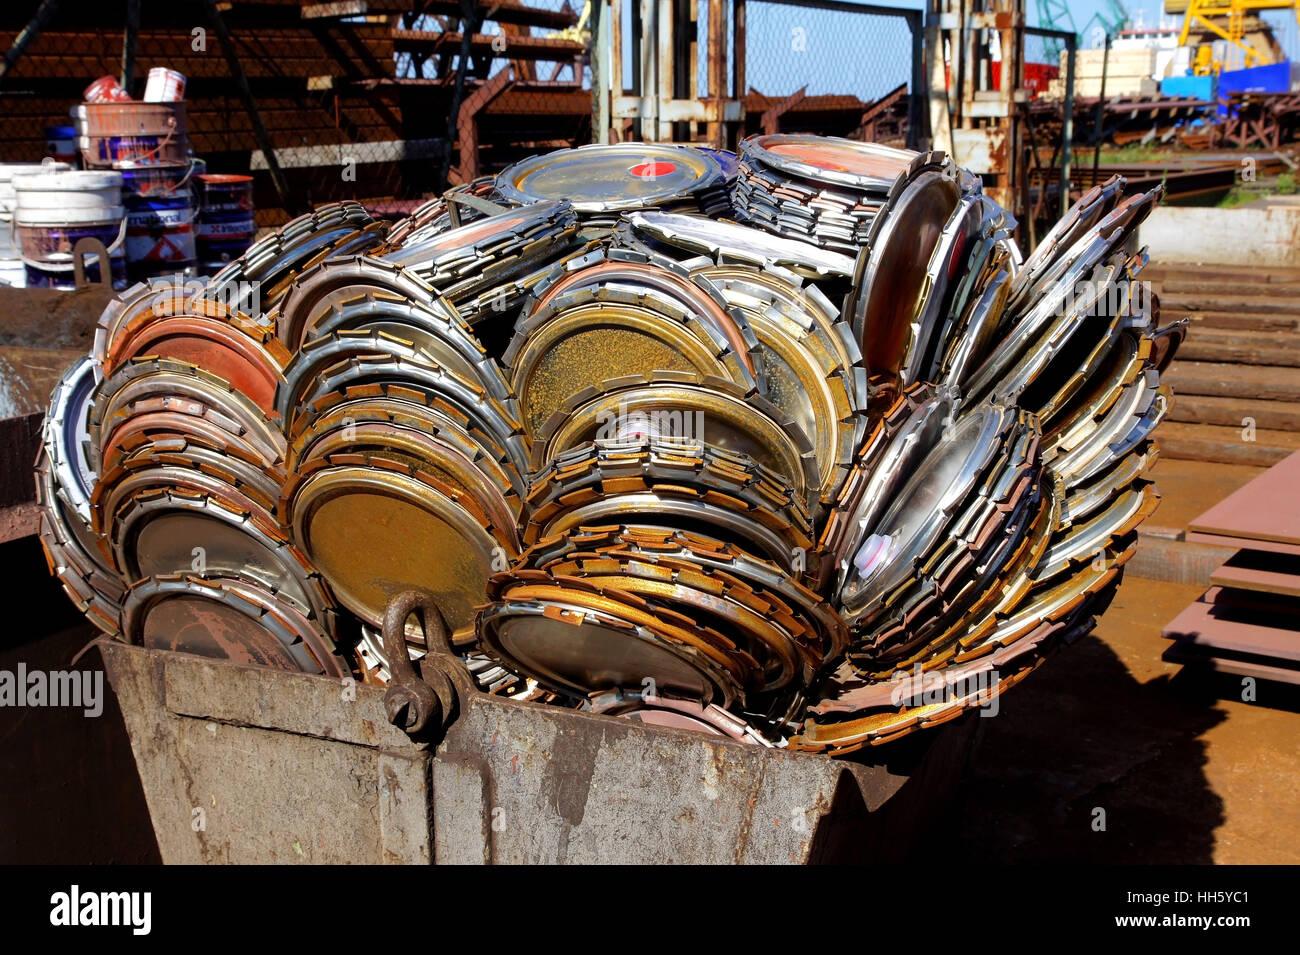 future, trash, scrap, heap, reuse, waste, squandering, slim, arid, sligth, Stock Photo